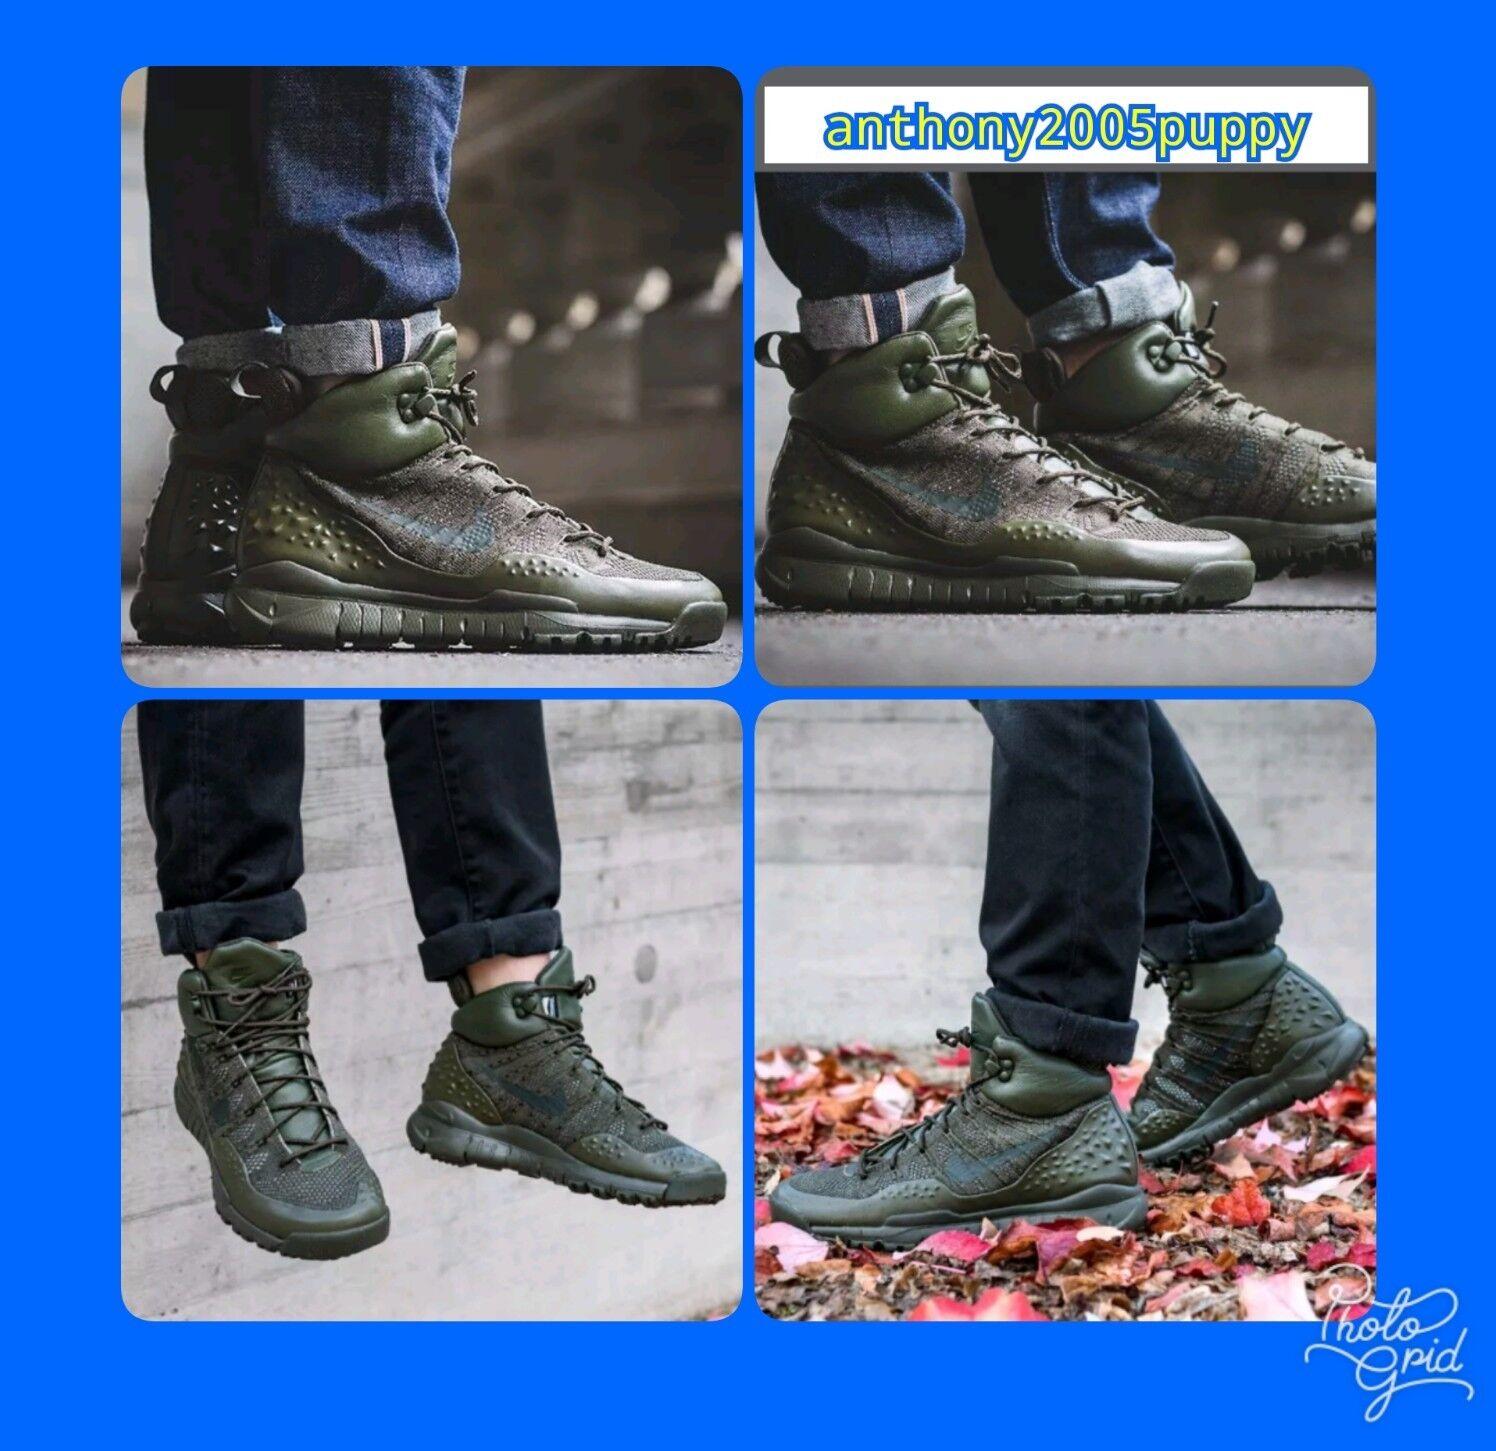 Nike Lupinek Flyknit 862505-300 11, Cargo Kaki Taille USA 11, 862505-300 b452f7